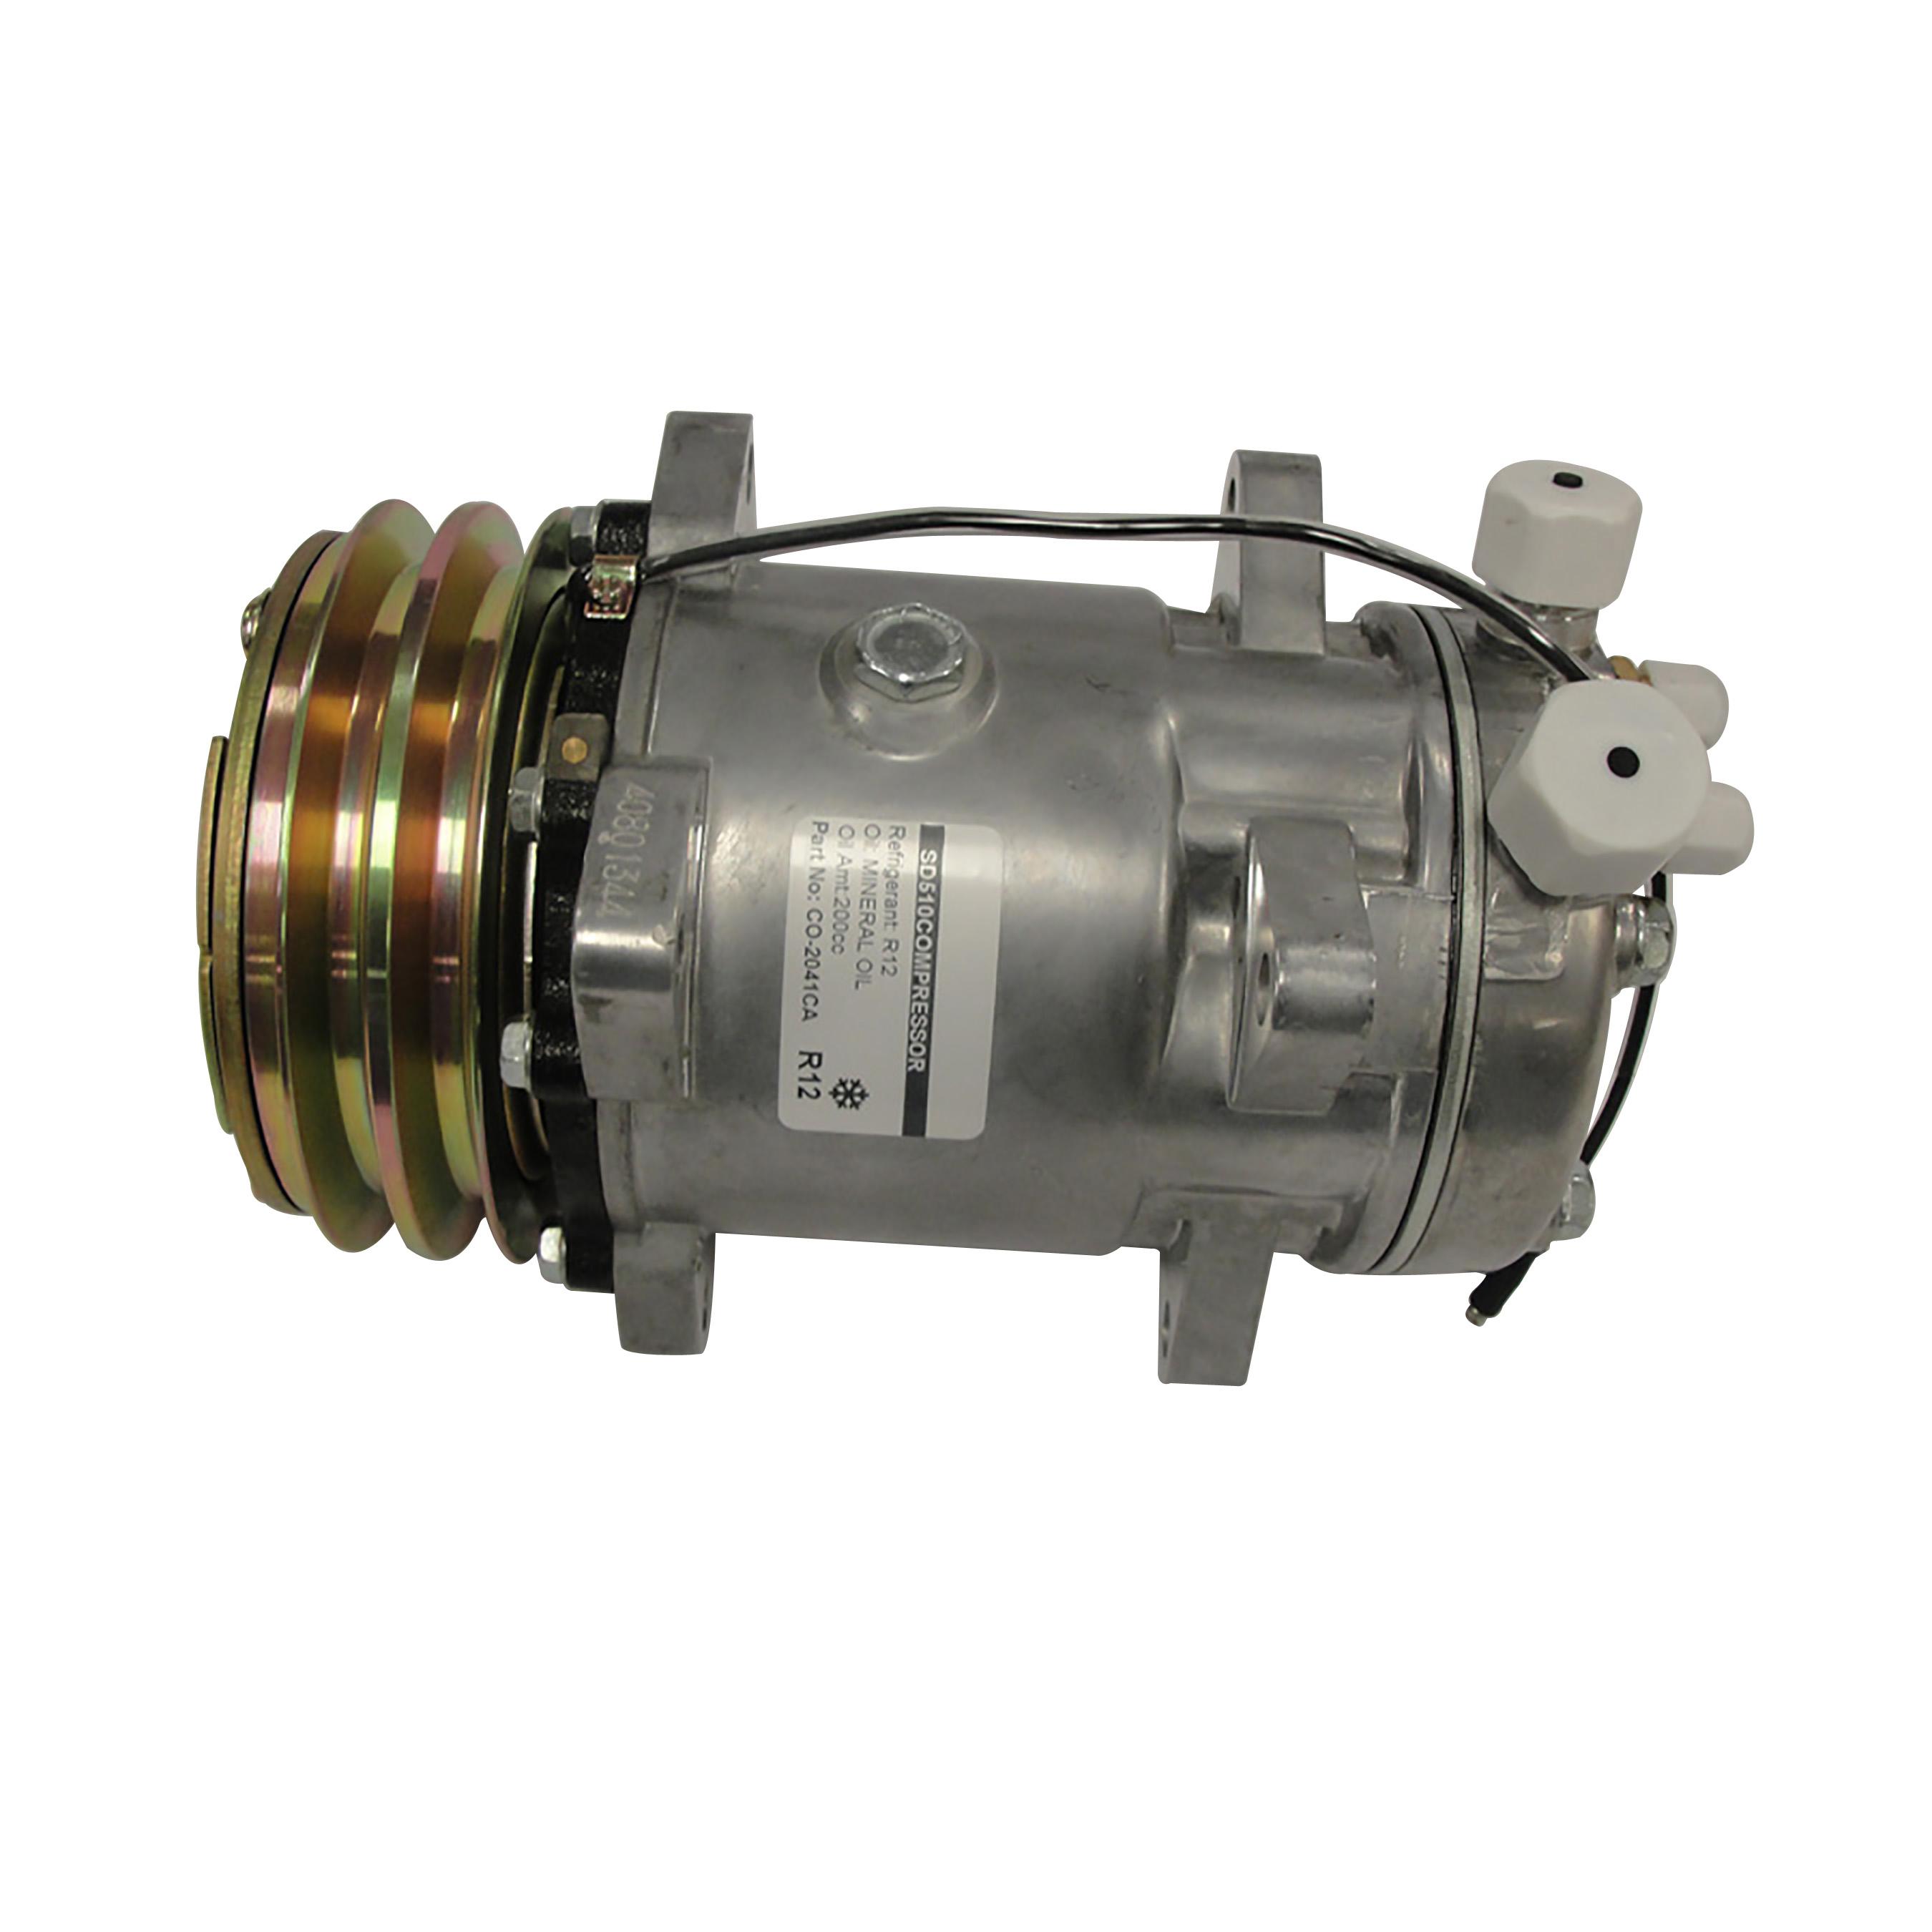 International Harvester Compressor Diameter: 5 1/4